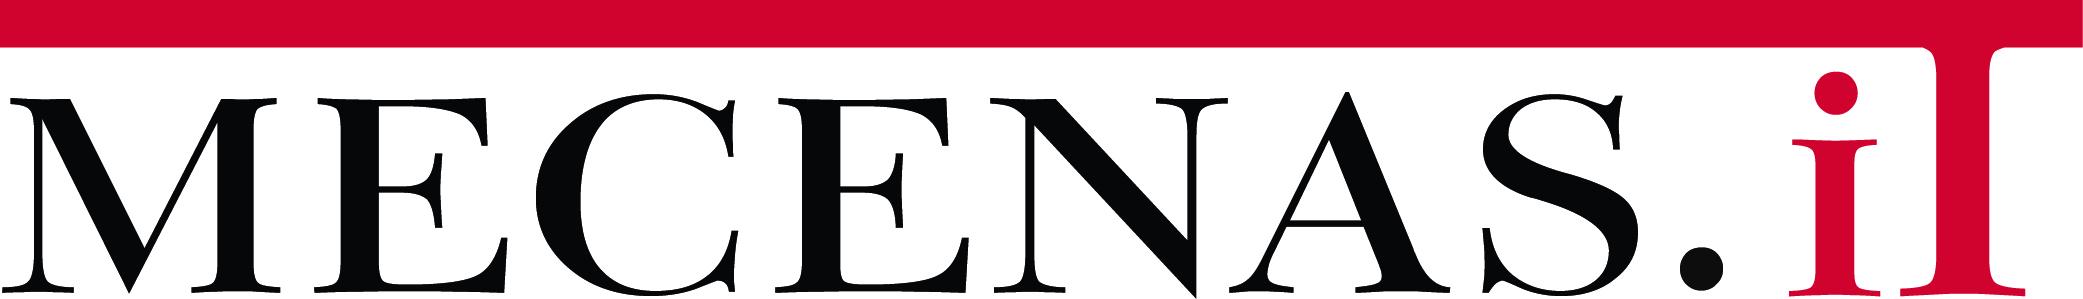 mecenas-logotyp